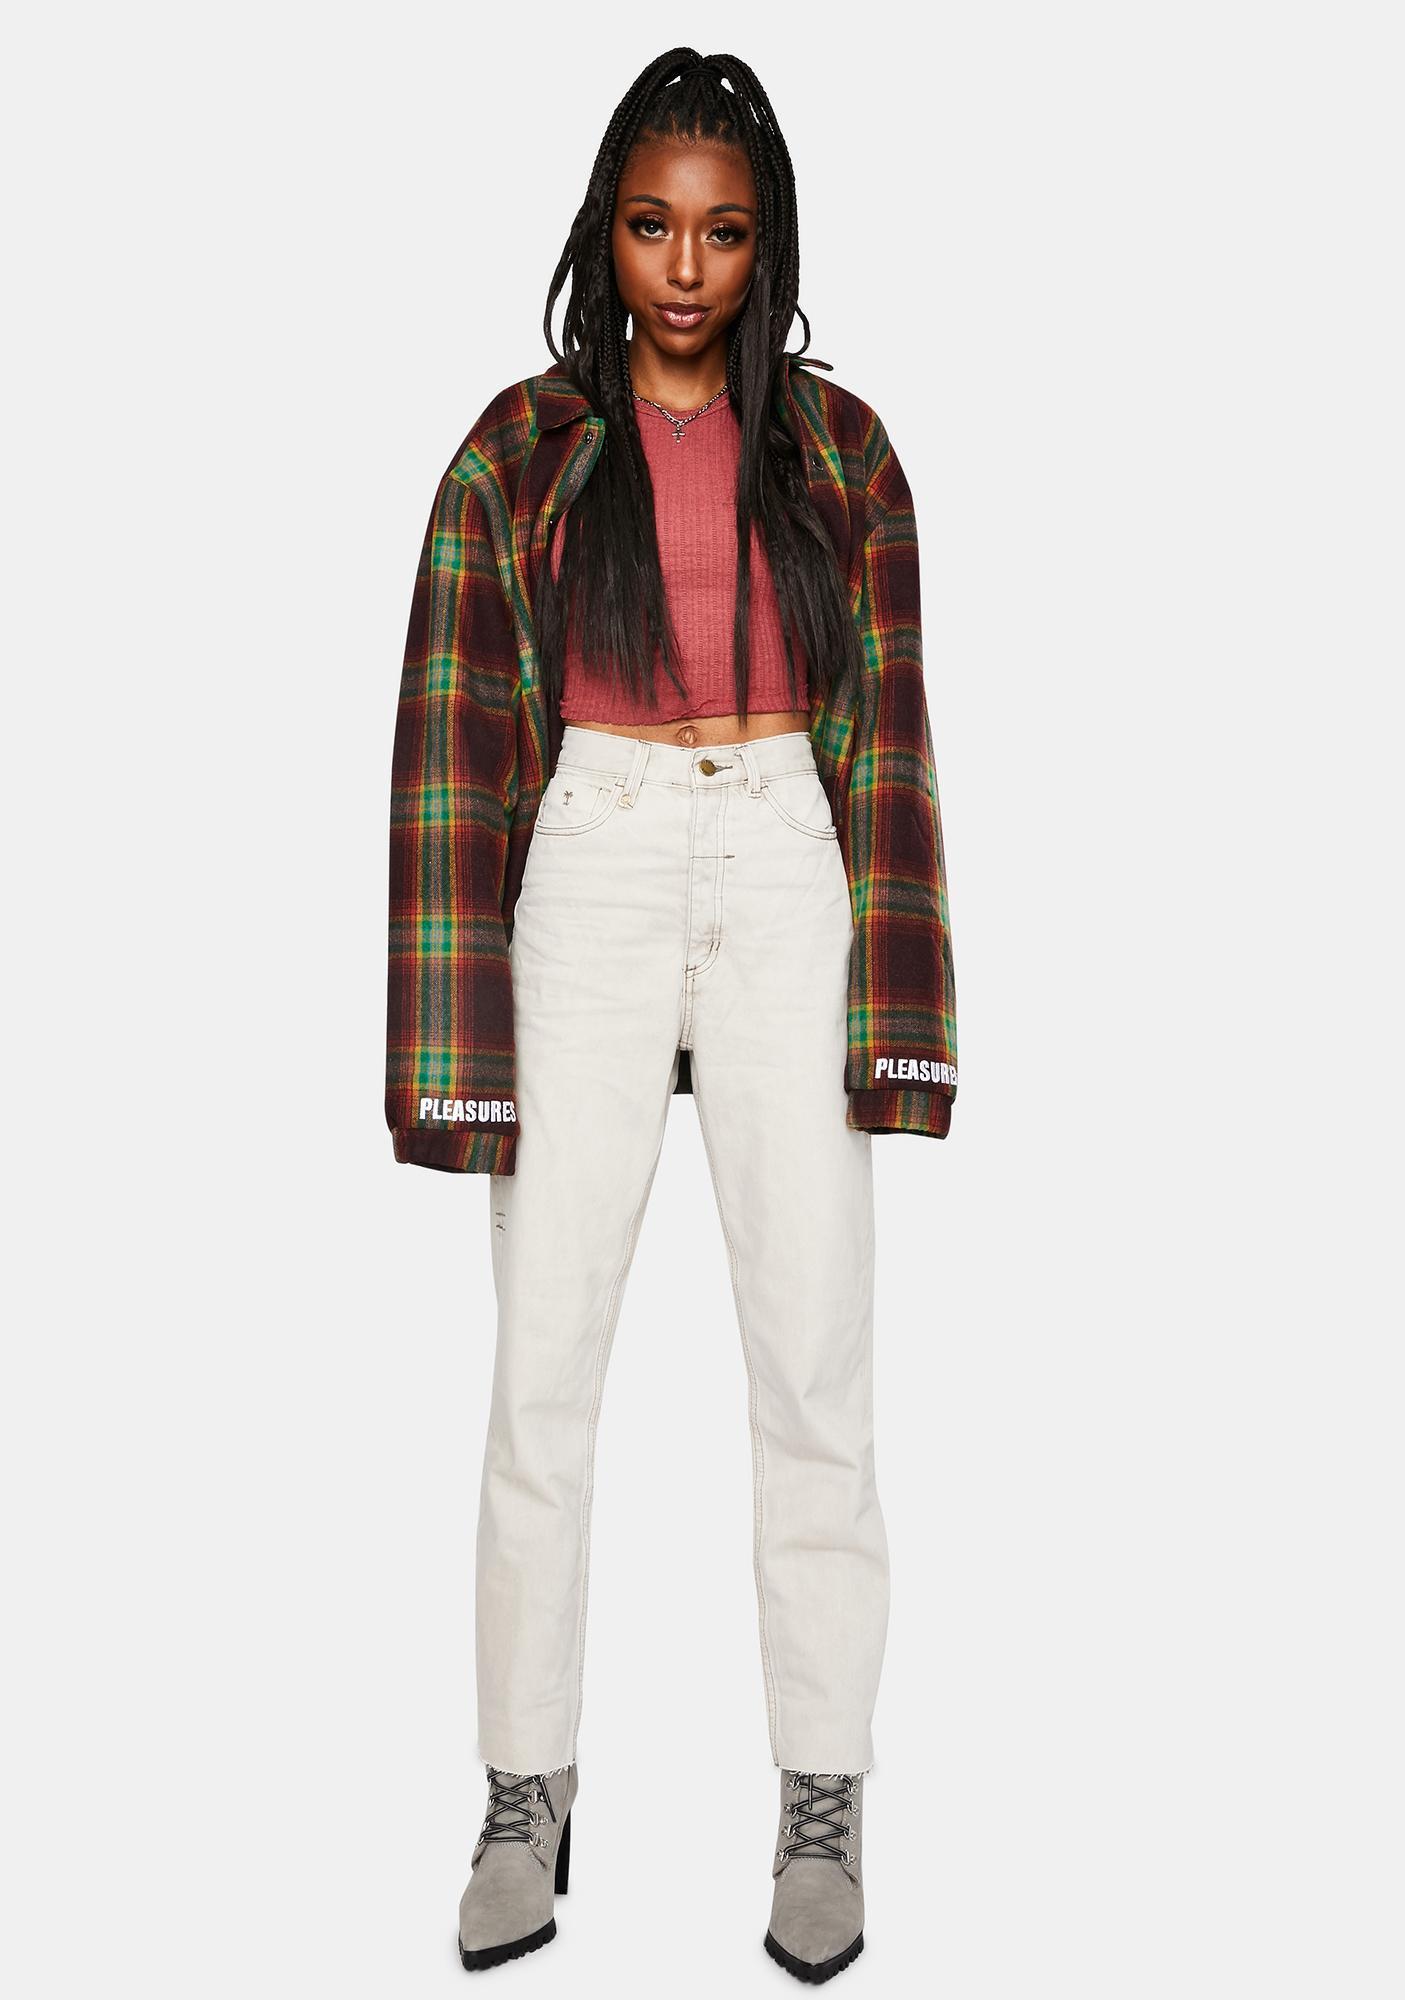 THRILLS Oat Paige Denim Jeans